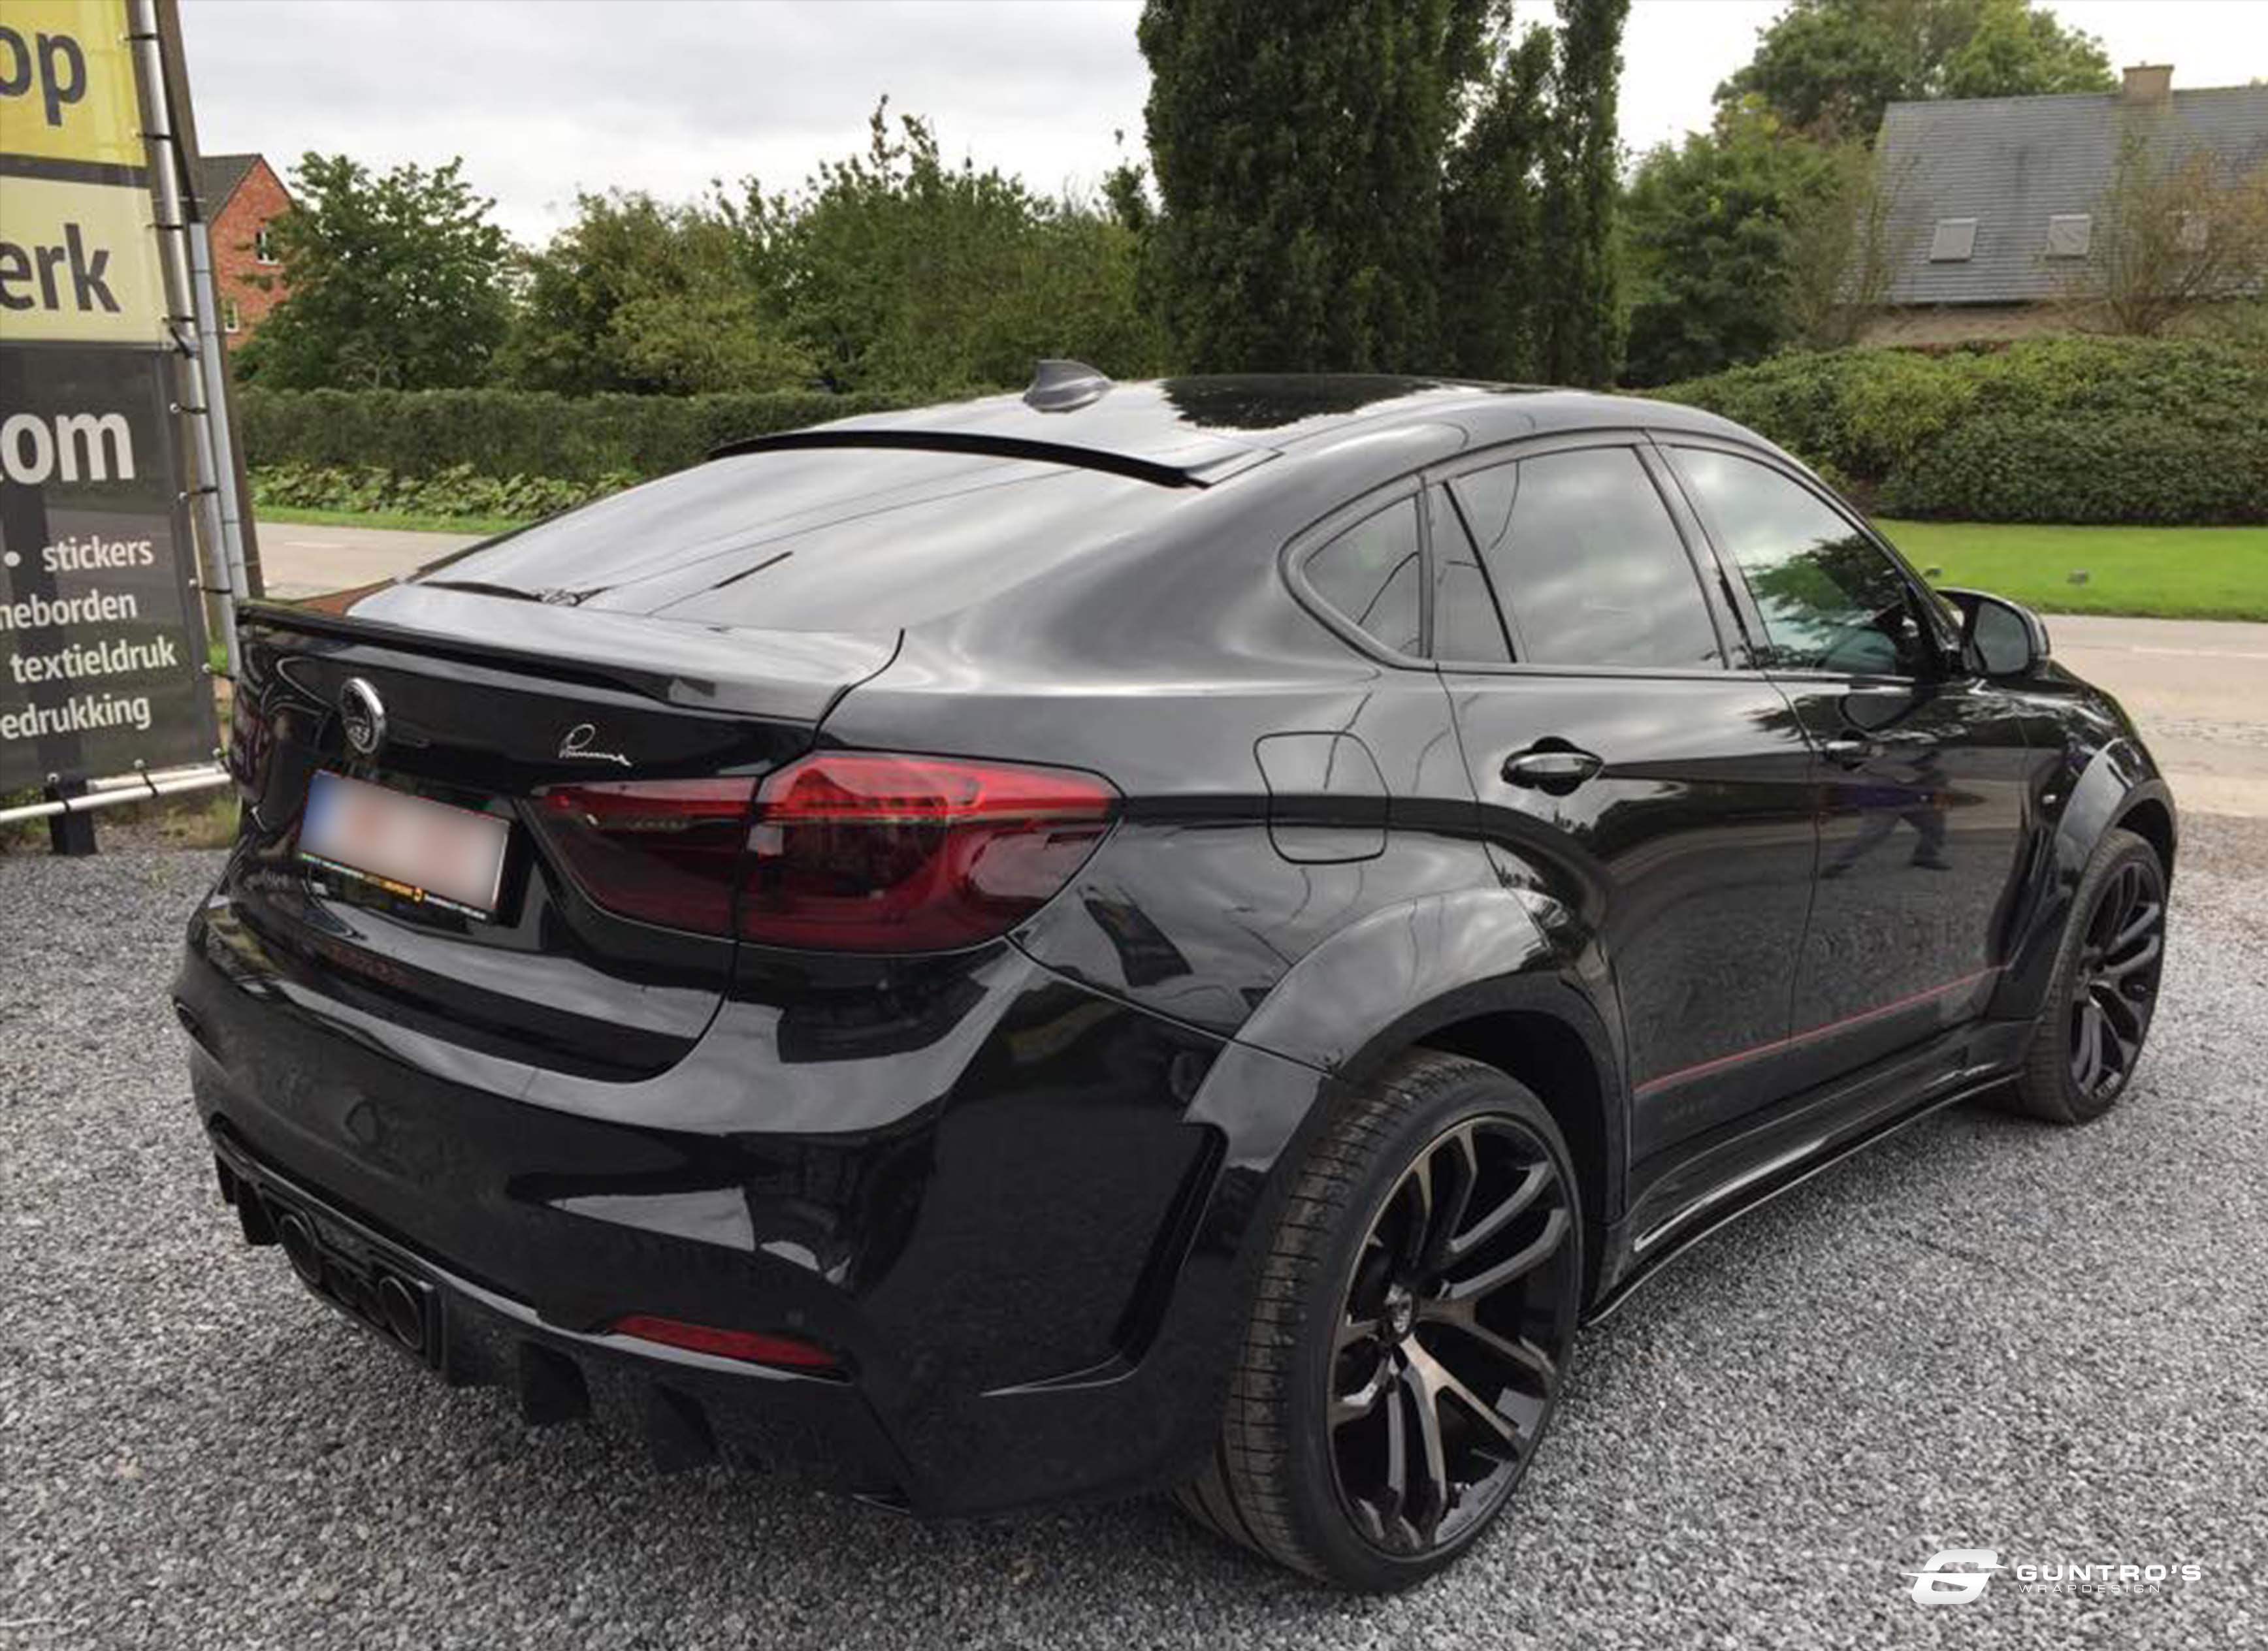 ACCENT WRAP BMW X6 LUMMA DESIGN